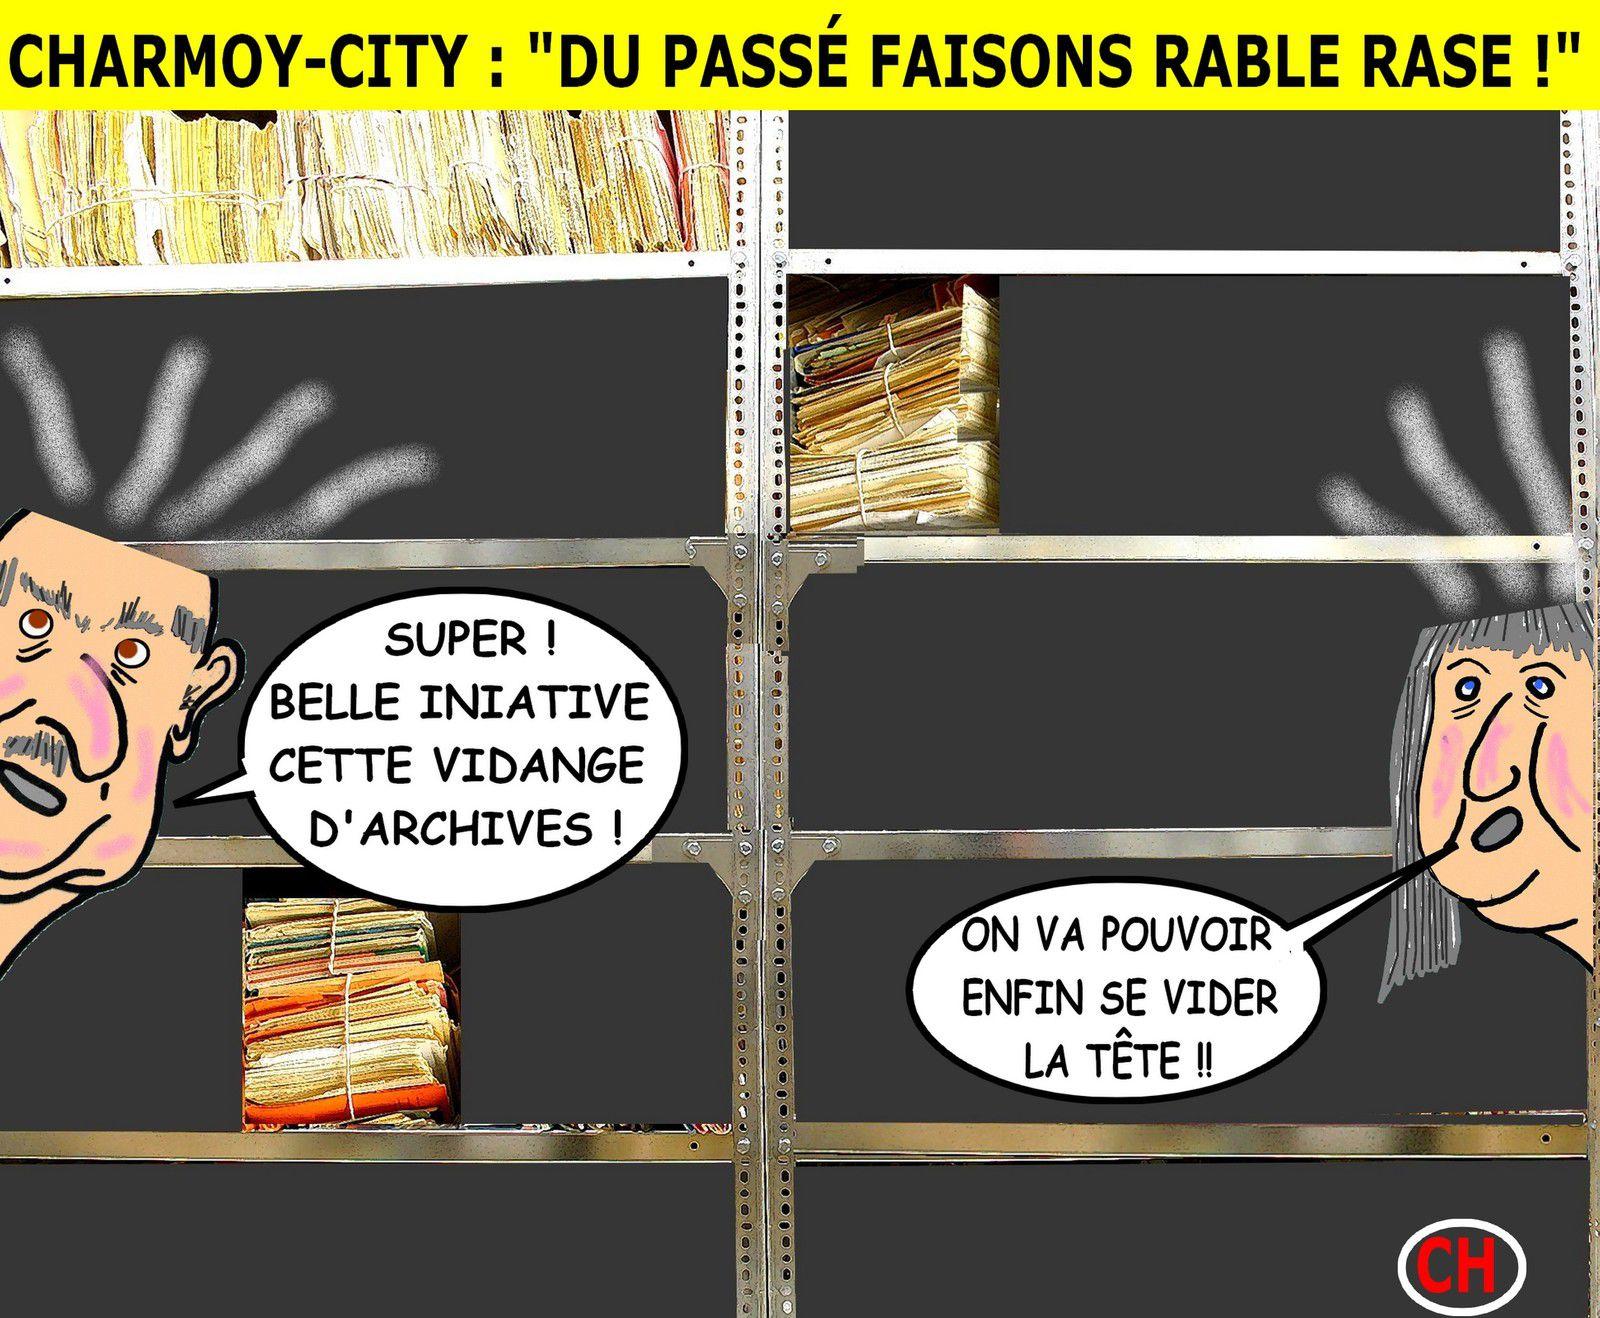 Charmoy-City, du passé faisons table rase.jpg